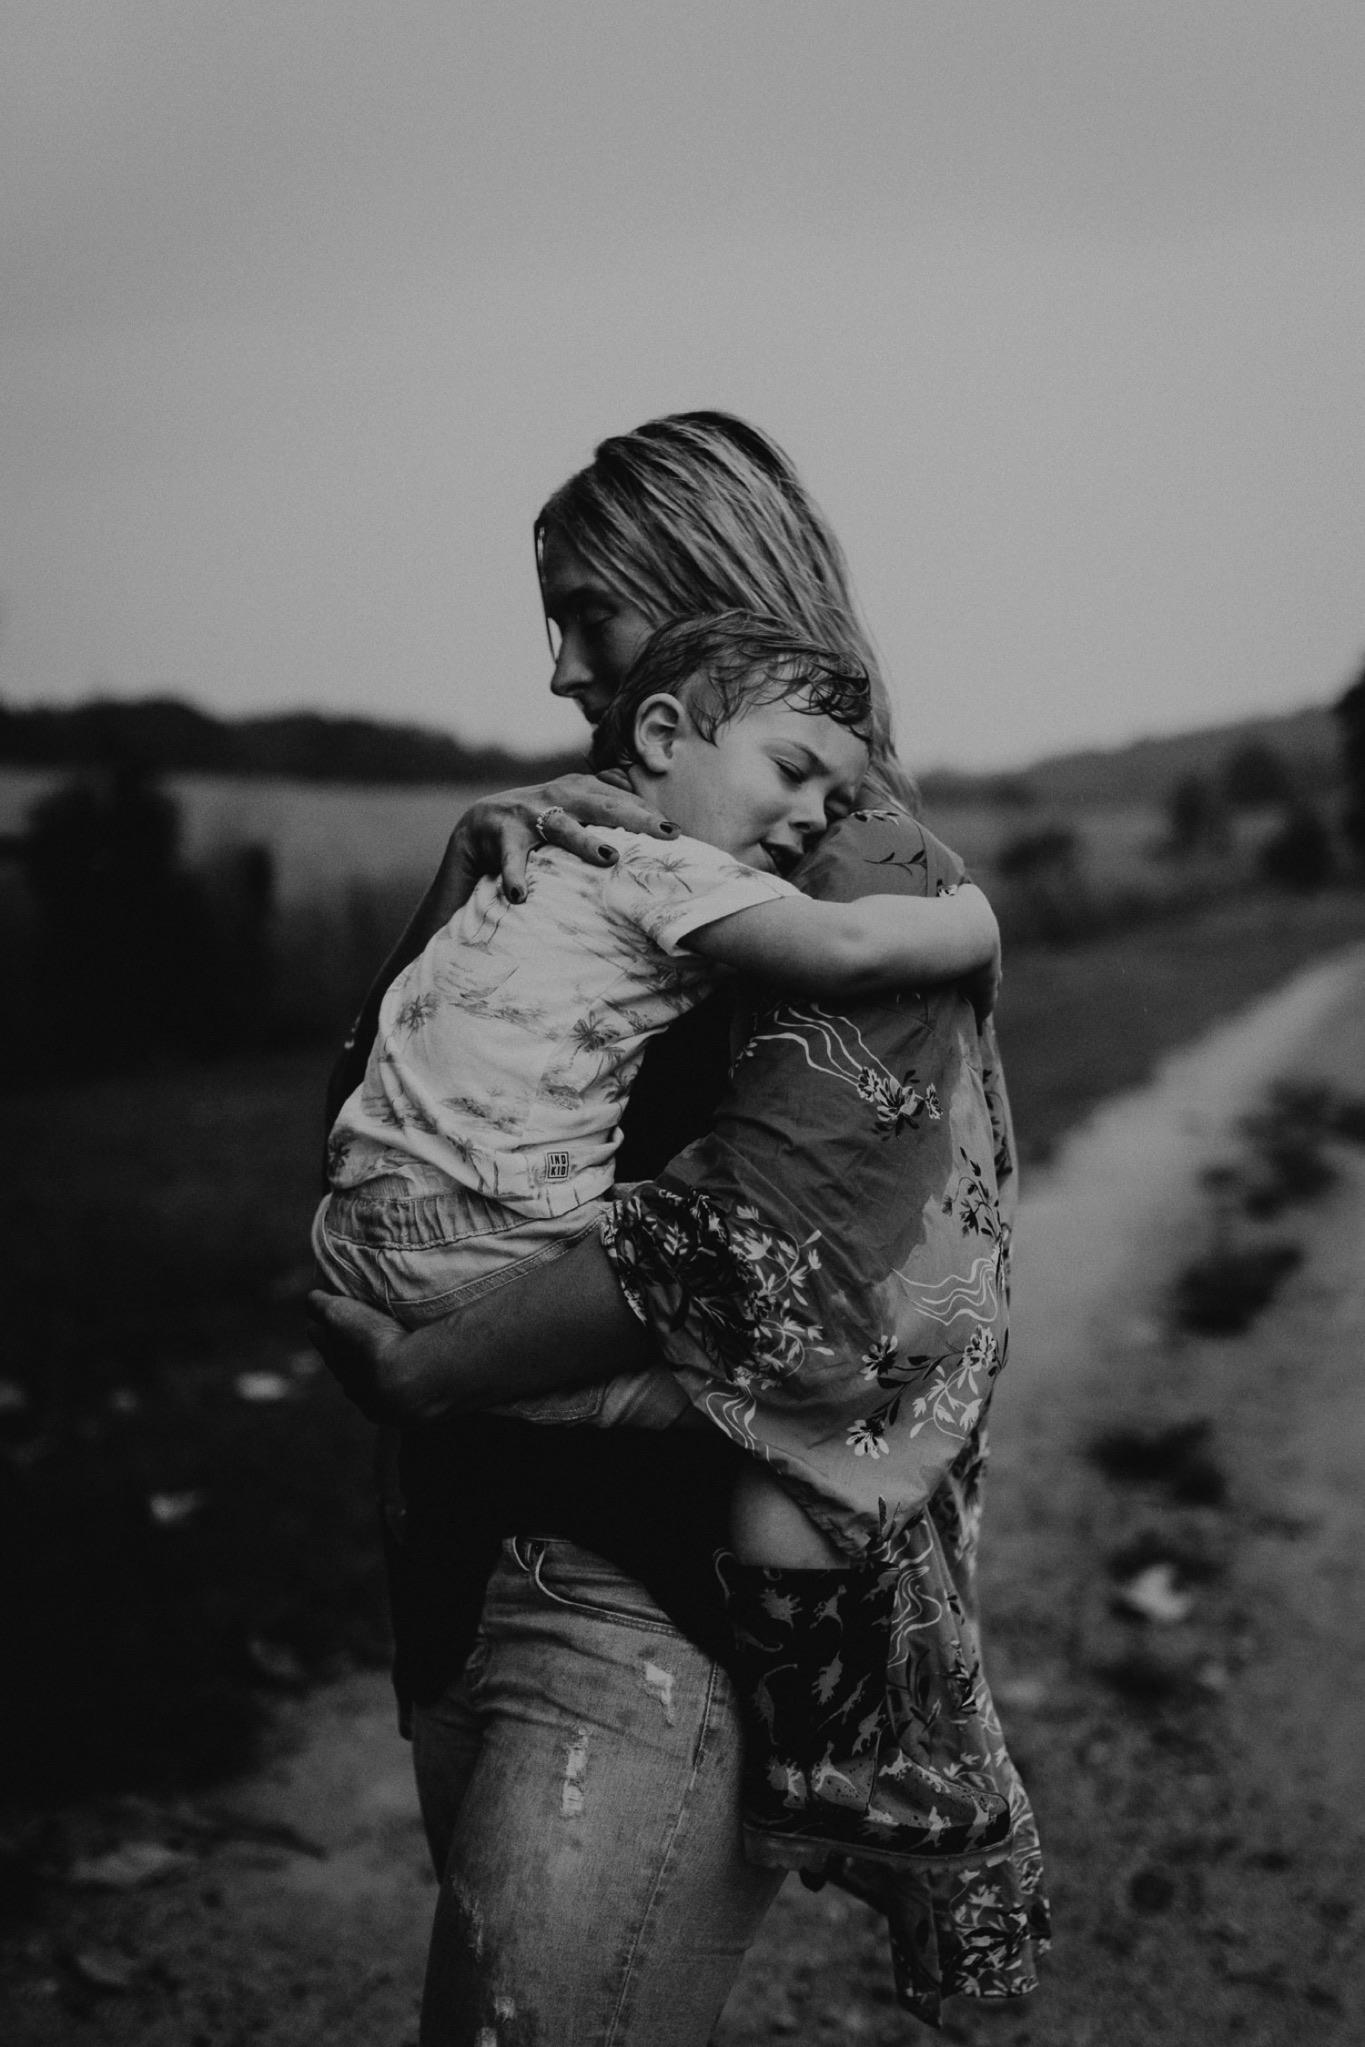 000000010_LOVEHERWILDPHOTOGRAPHY_135_byronbaymotherhoodphotographer_byronbayfamilyphotographer_motherhoodphotography_byronbay_rainyphotoshoot_Loveherwildphotography_byronbayphotographer.jpg